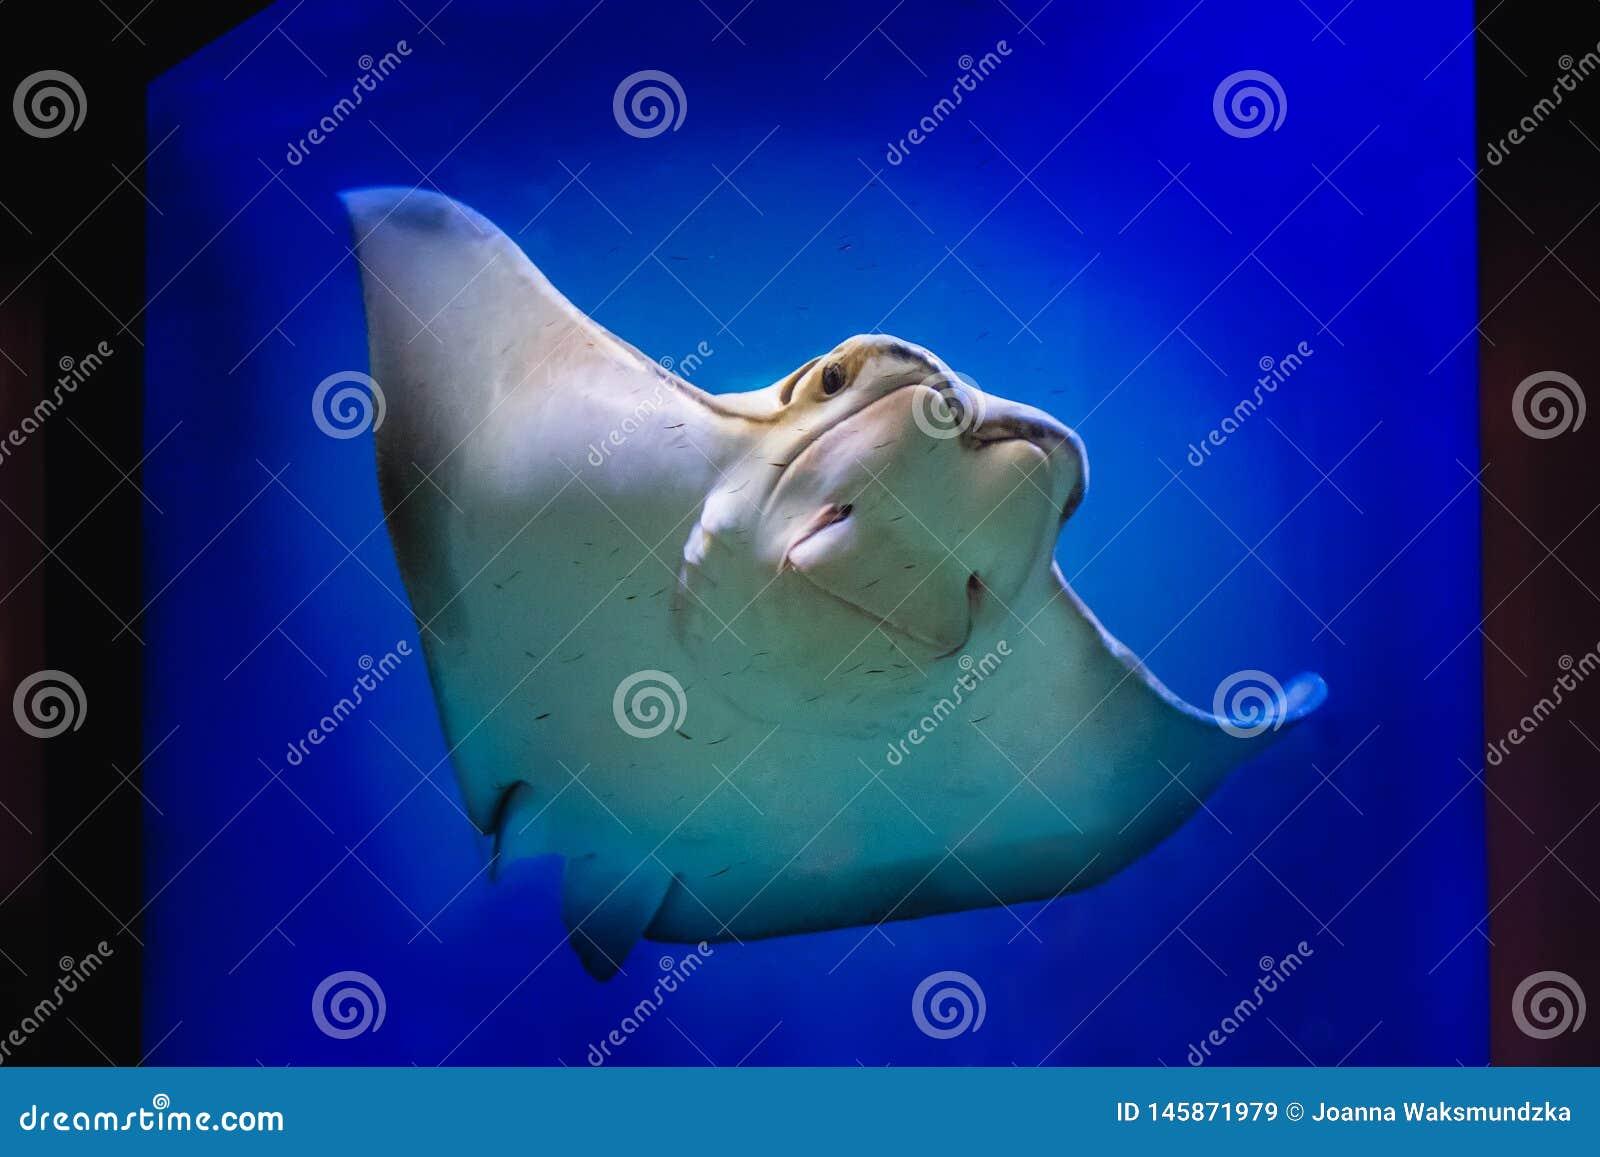 A friendly stingray swimming in a large aquarium tank.